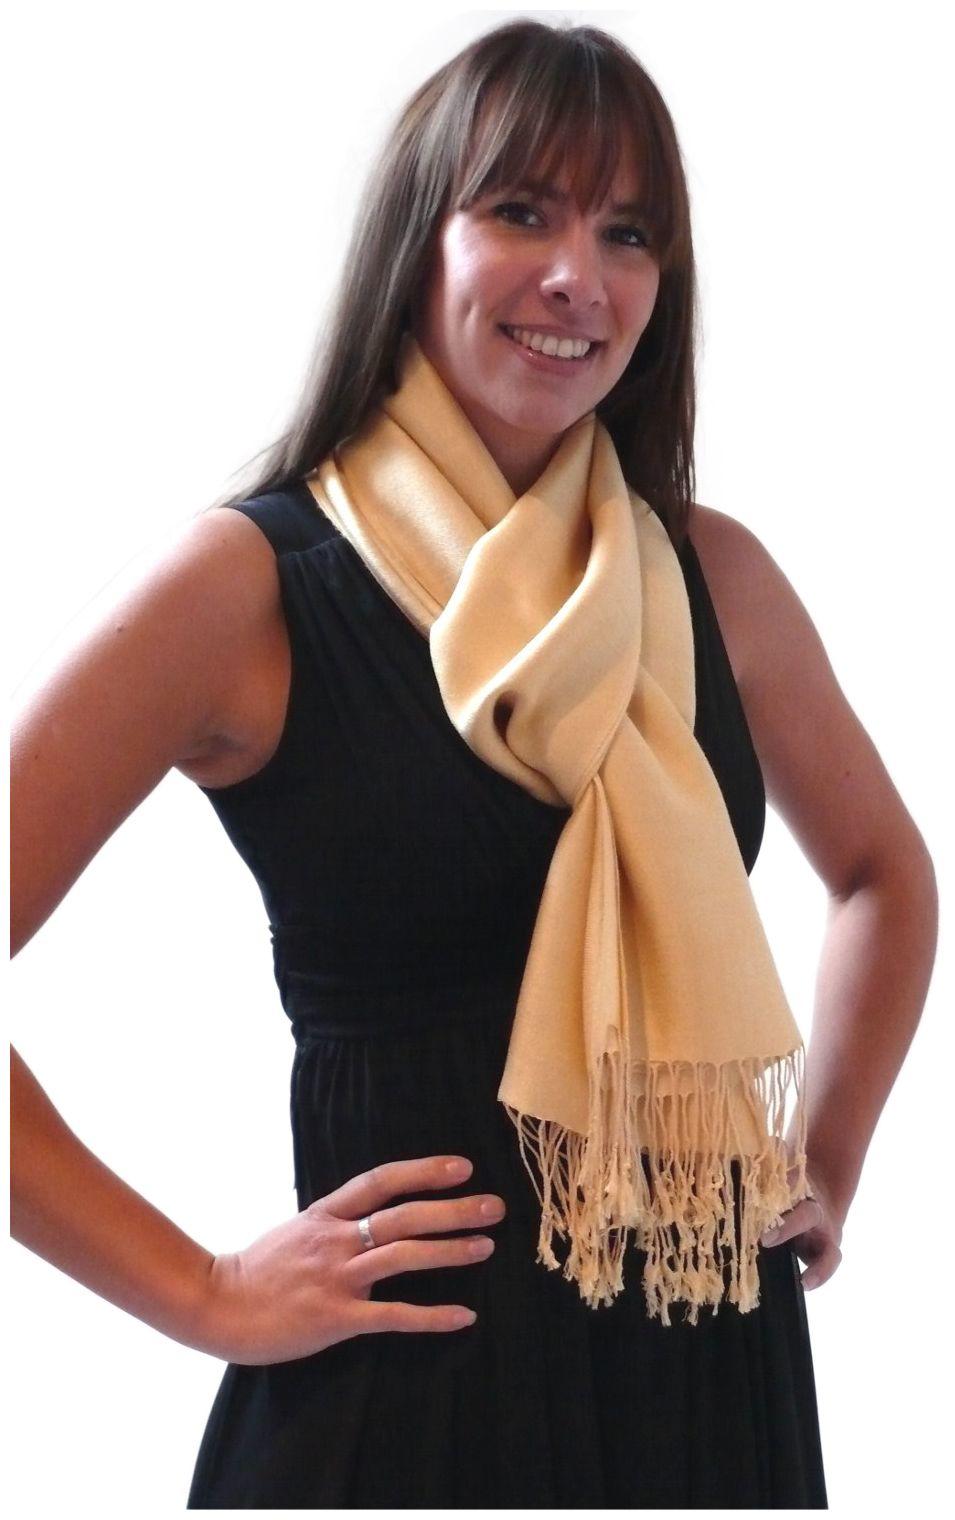 Rich Cream Solid Color Design Pashmina Shawl Scarf Wrap Pashminas Shawls Scarves Wraps NEW a1108-405